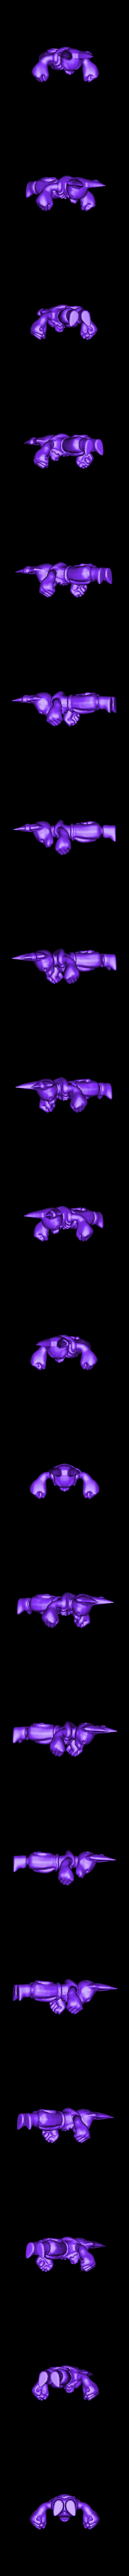 beerus.stl Download free STL file Keshiverse - Beerus (Dragonball Super) • 3D printable object, whackolantern